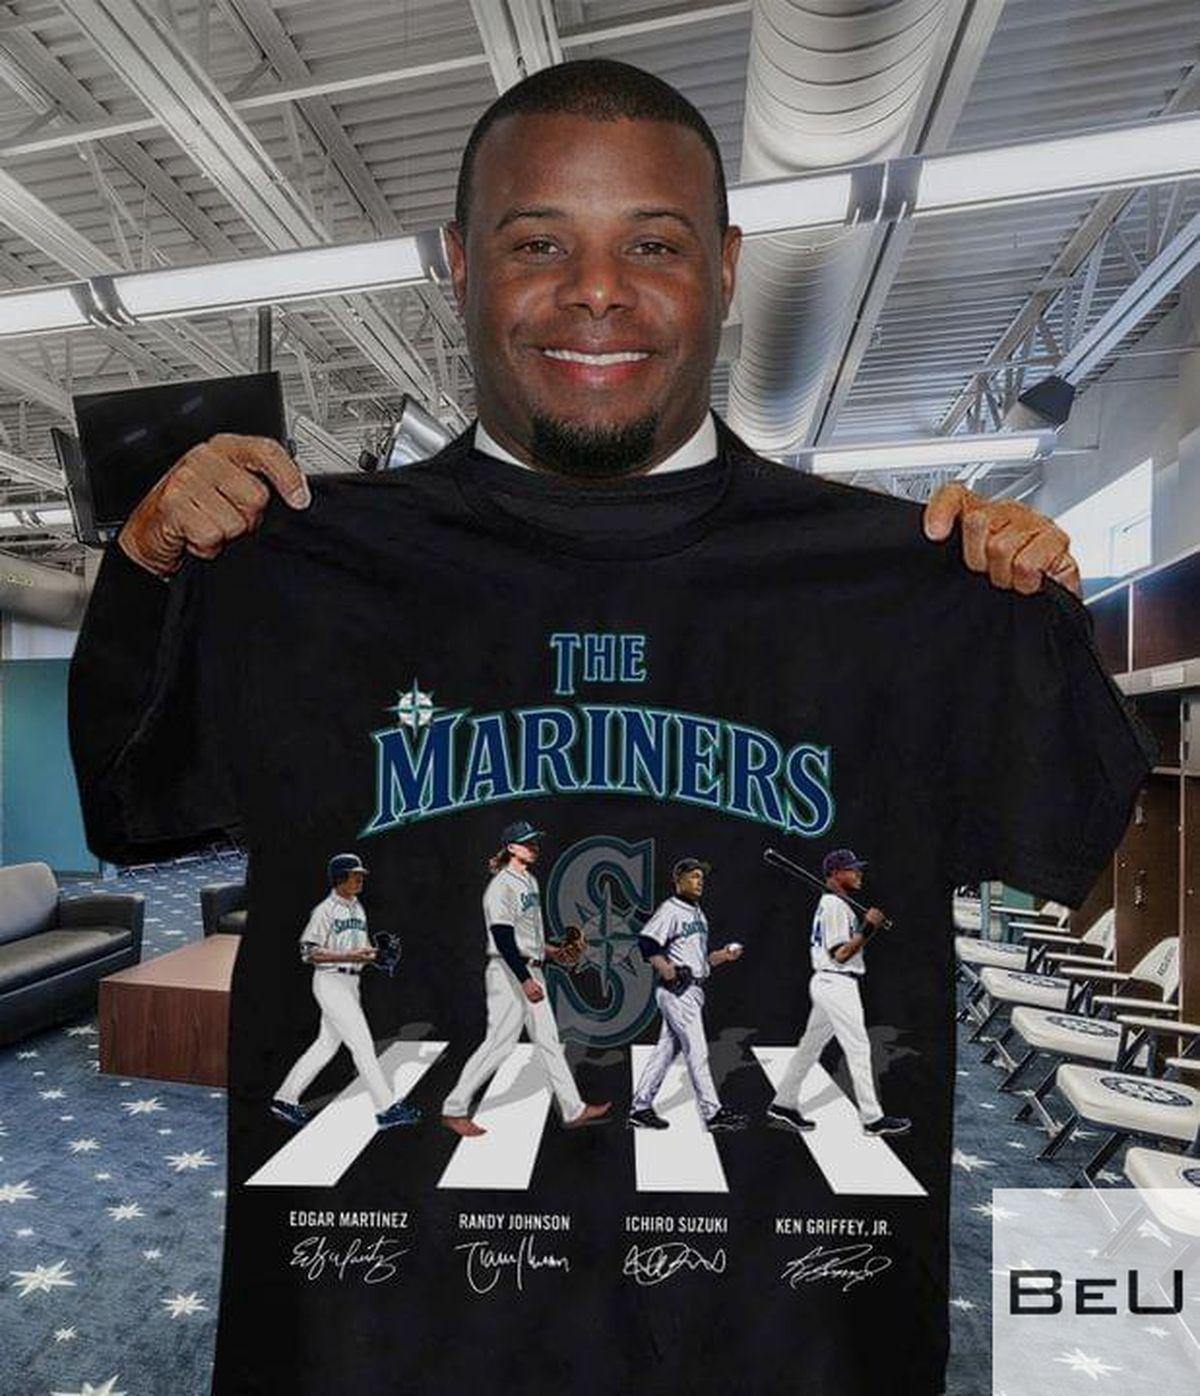 The Mariners Edgar Martinez Randy Johnson Ichiro Suzuki Ken Griffey Jr Shirtv